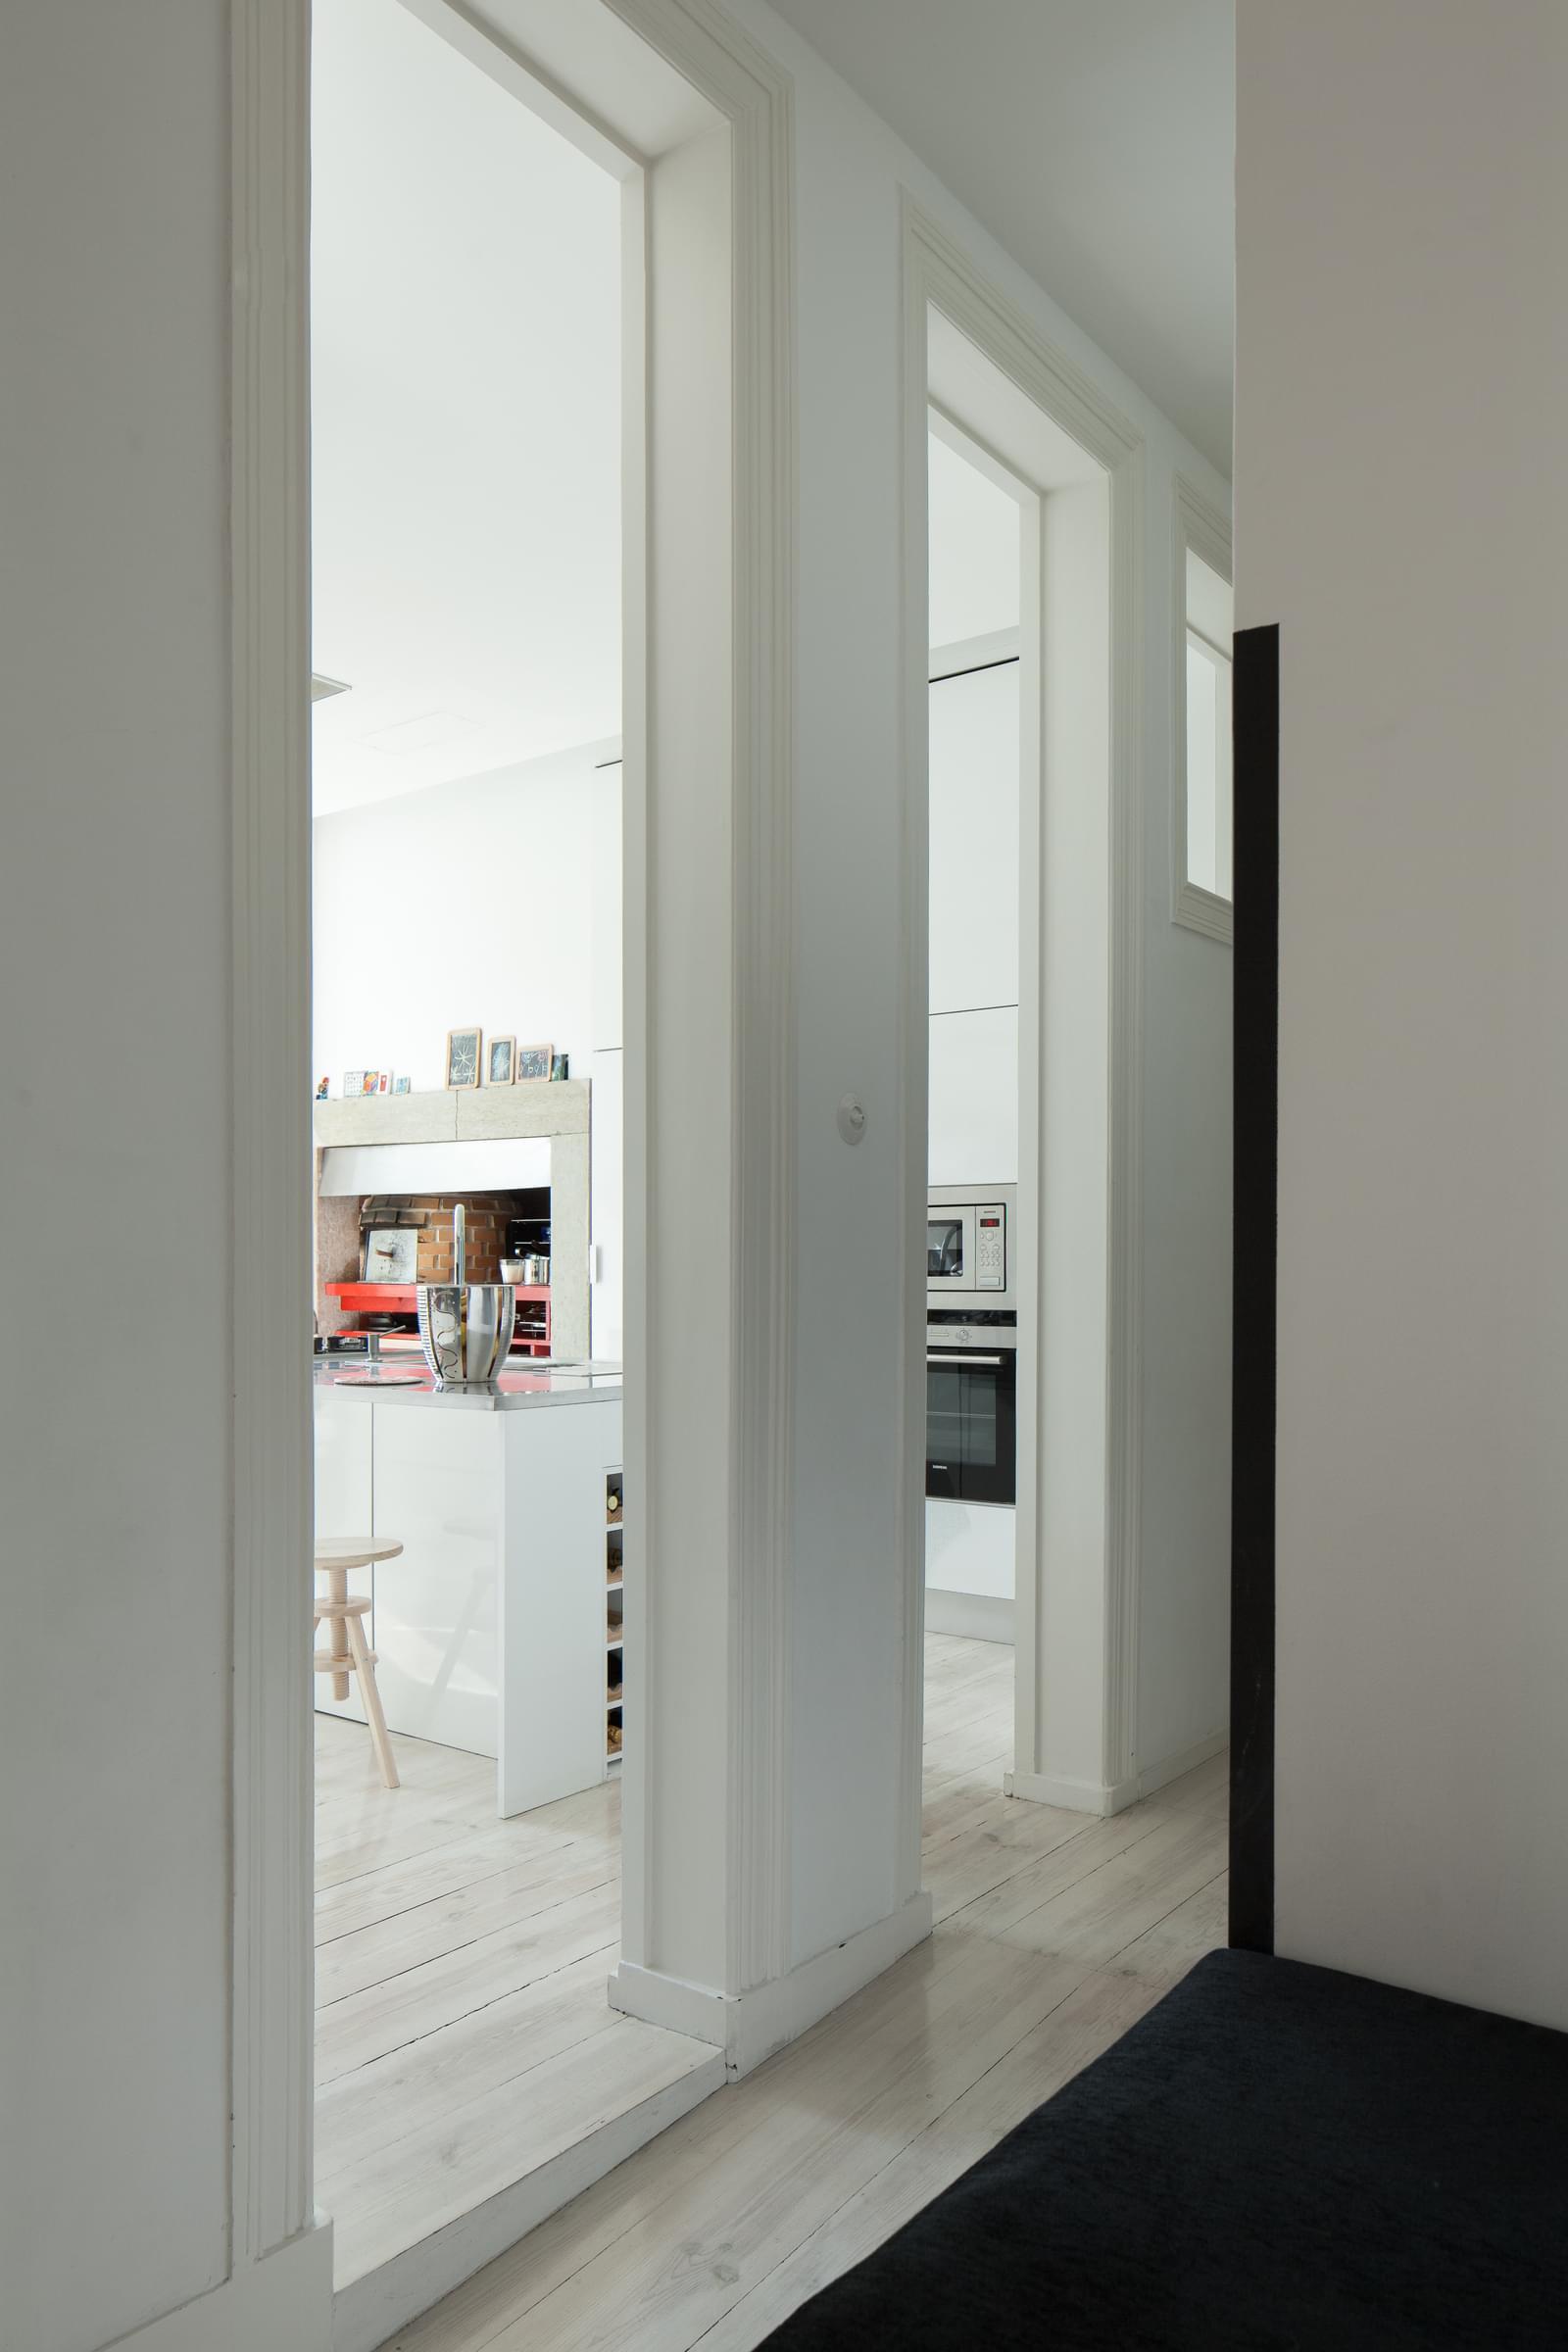 pf17588-apartamento-t4-1-lisboa-a31c332c-a7d5-41fd-b7f3-d0f114afbf27